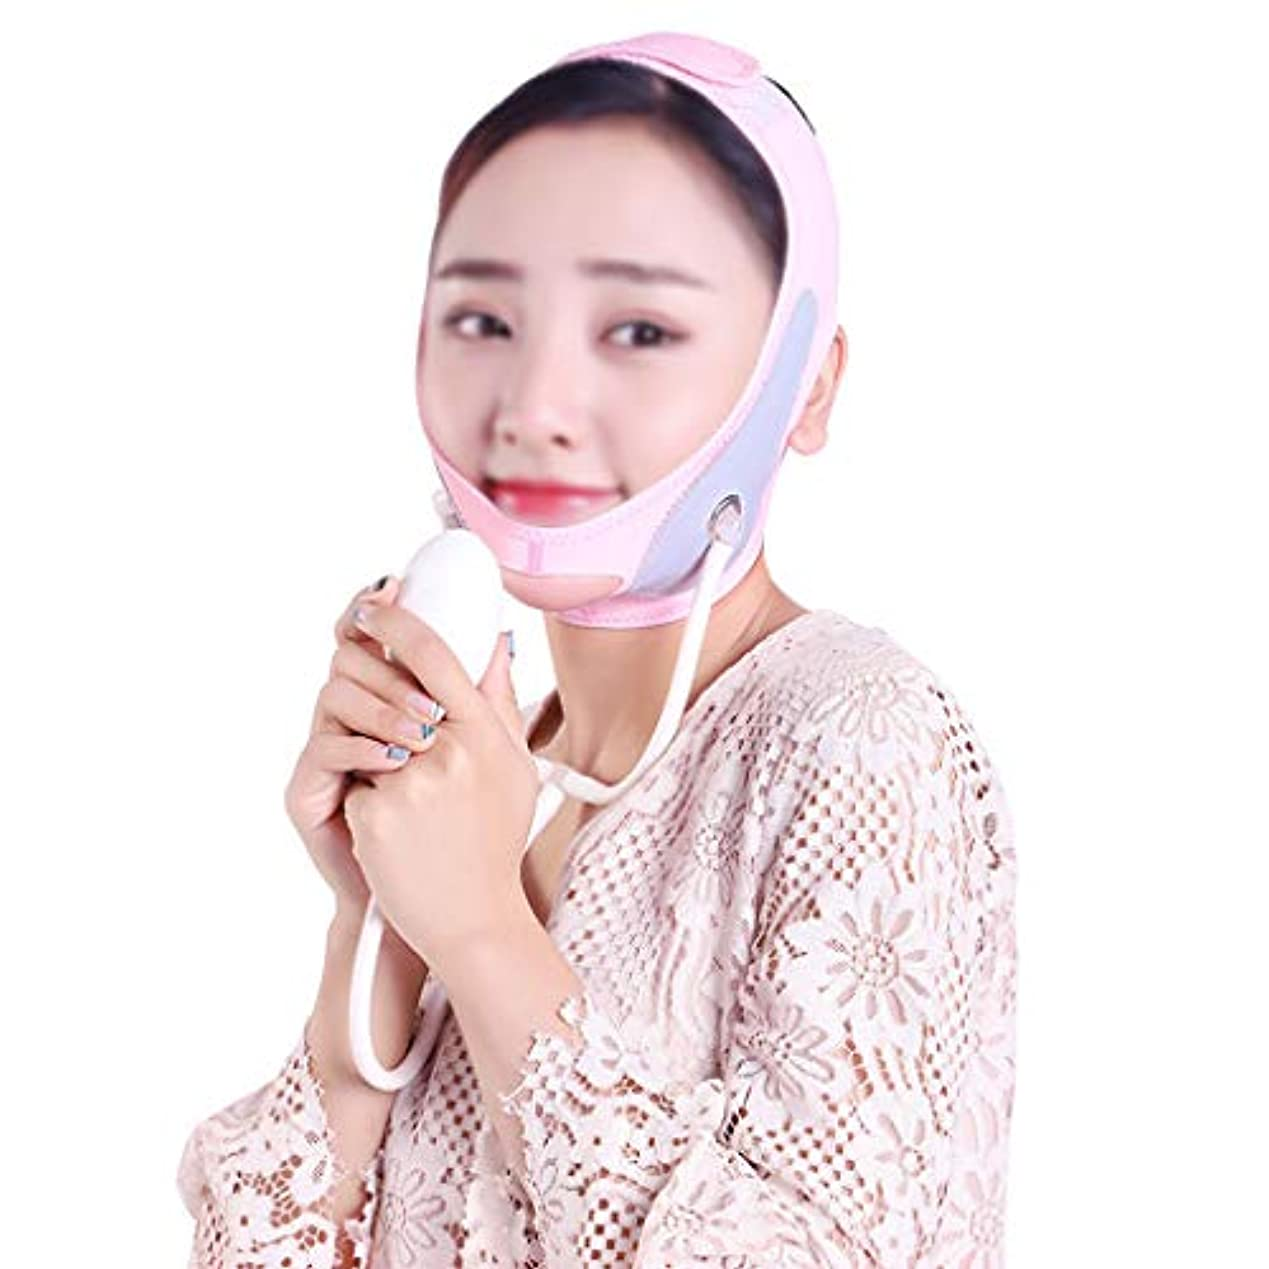 GLJJQMY 膨脹可能なマスクは小さいVの表面を作成するために皮の形づけおよび引き締めパターン/二重あごの包帯の人工物を高めます 顔用整形マスク